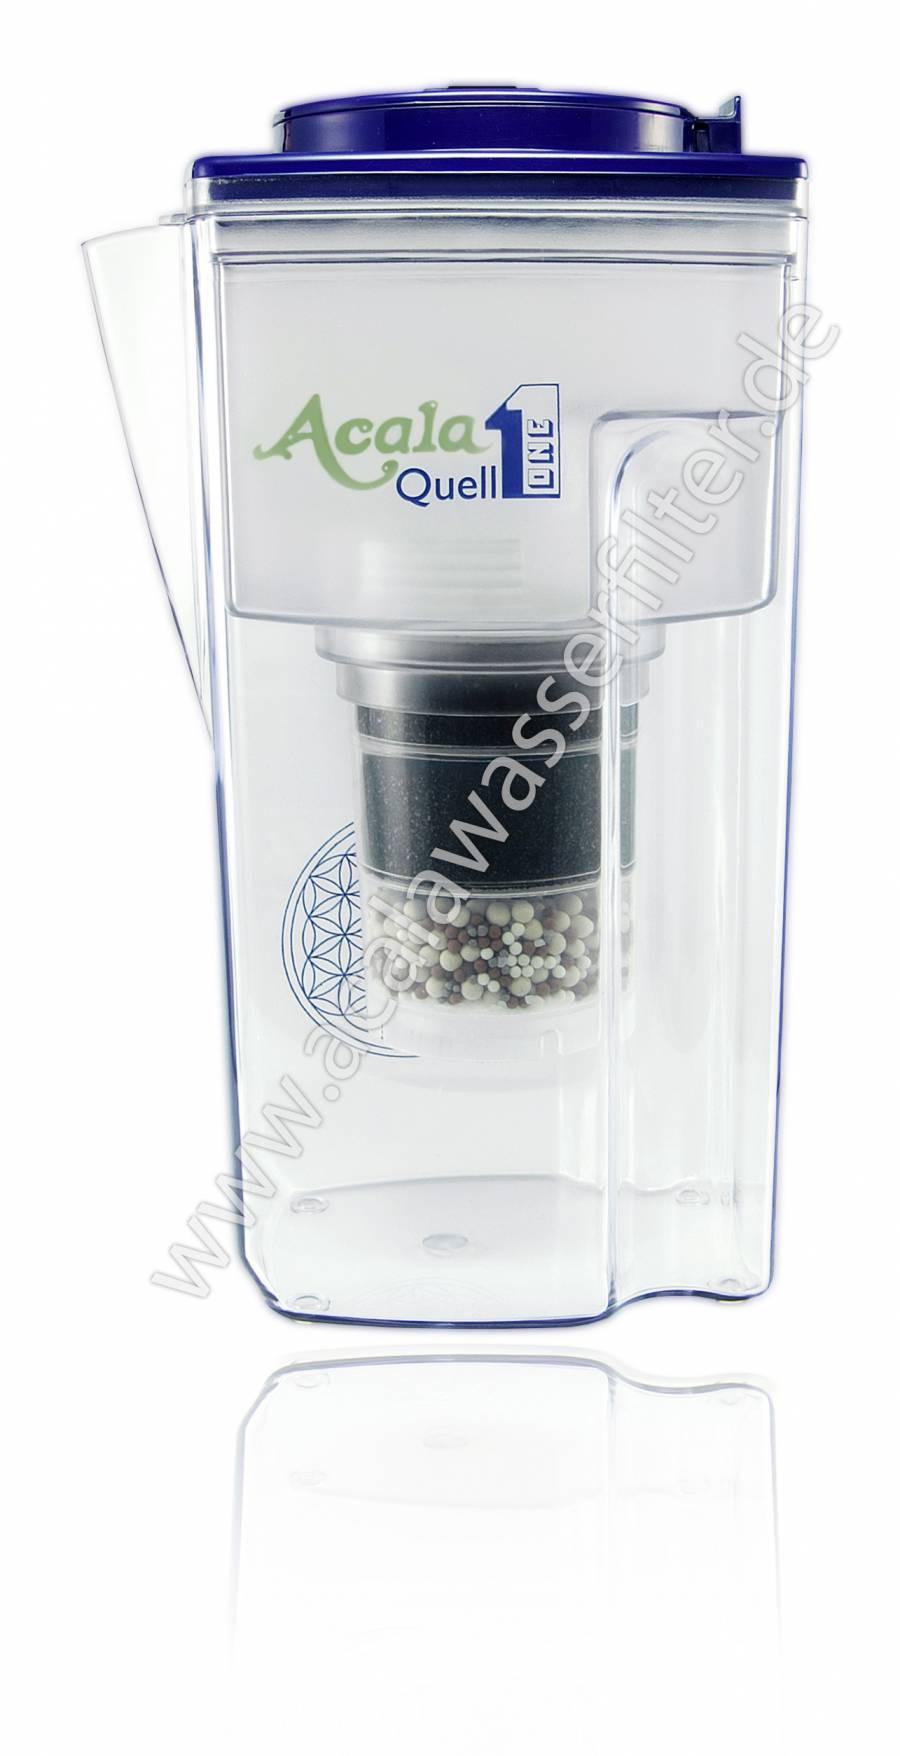 Acala Quell One - Wasserfilter dunkelblau